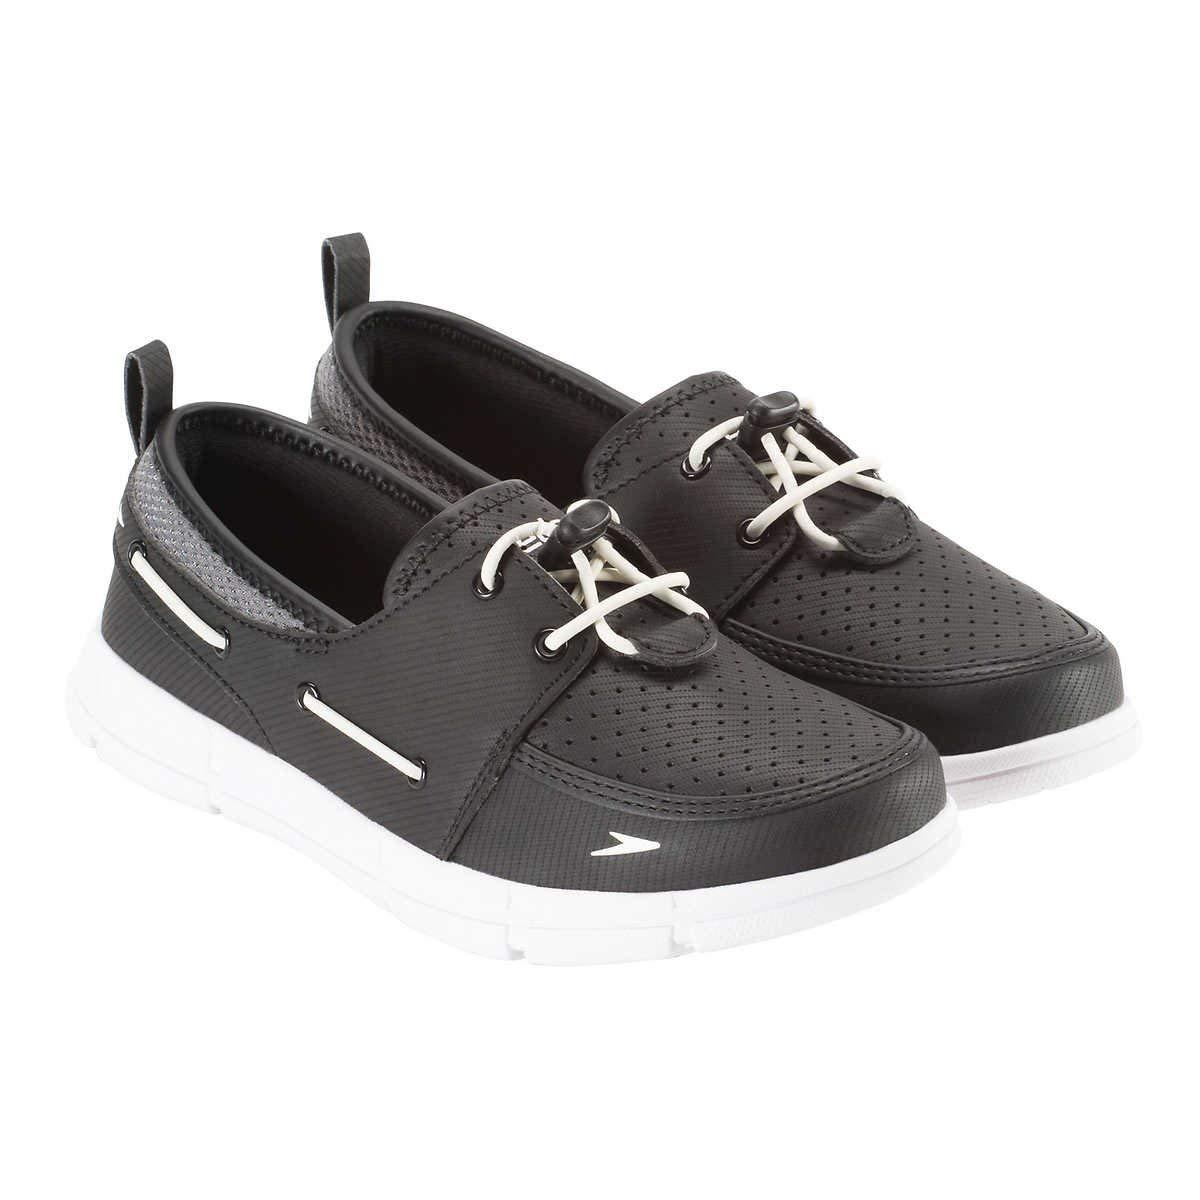 Speedo. Women's Port Lightweight Breathable Water Shoe (8 Black/Grey/White) by Speedo.